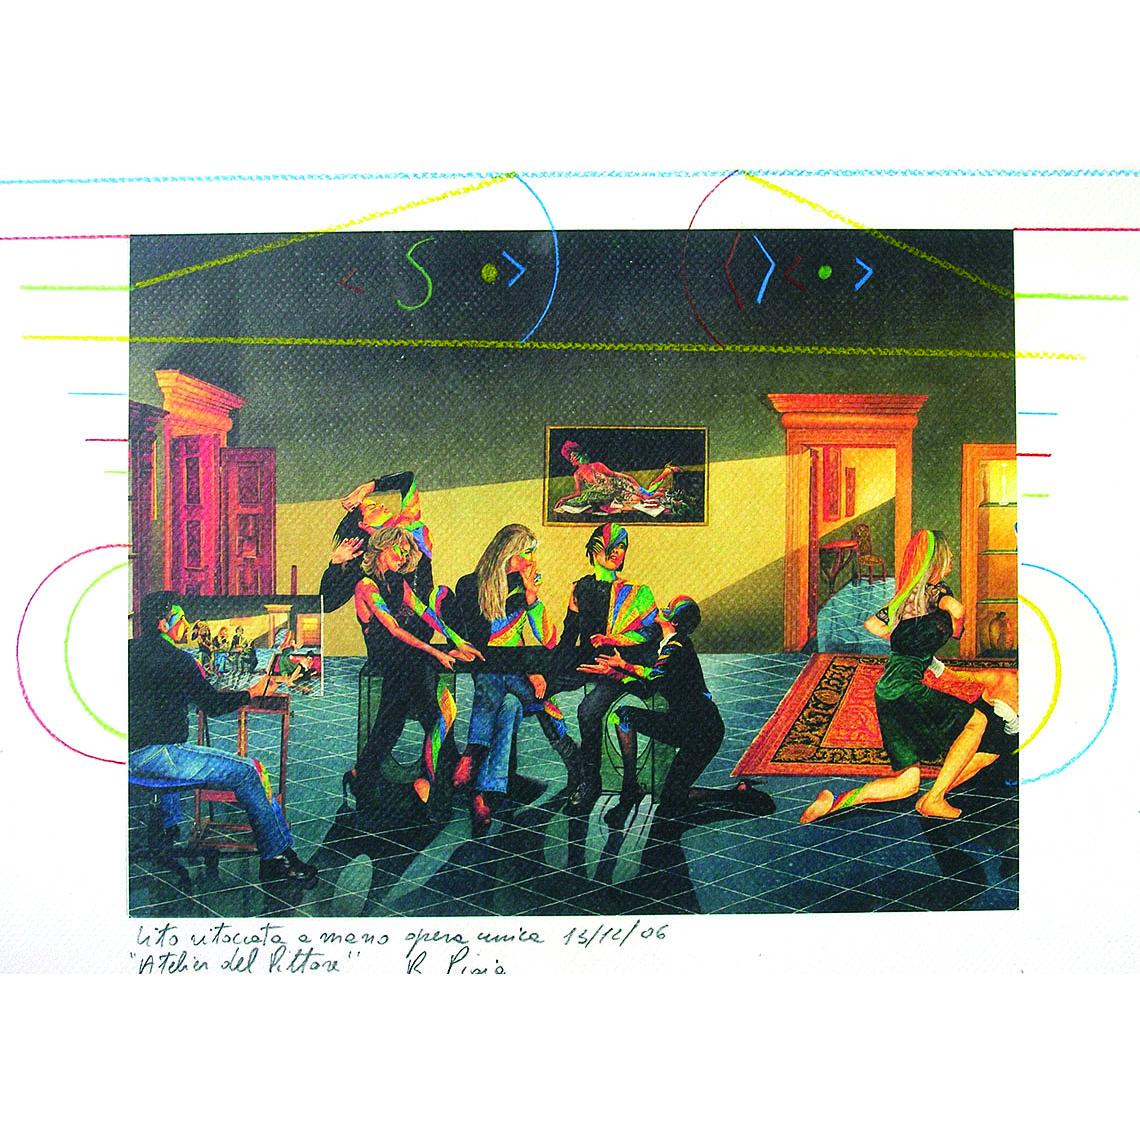 Ateliers des Malers